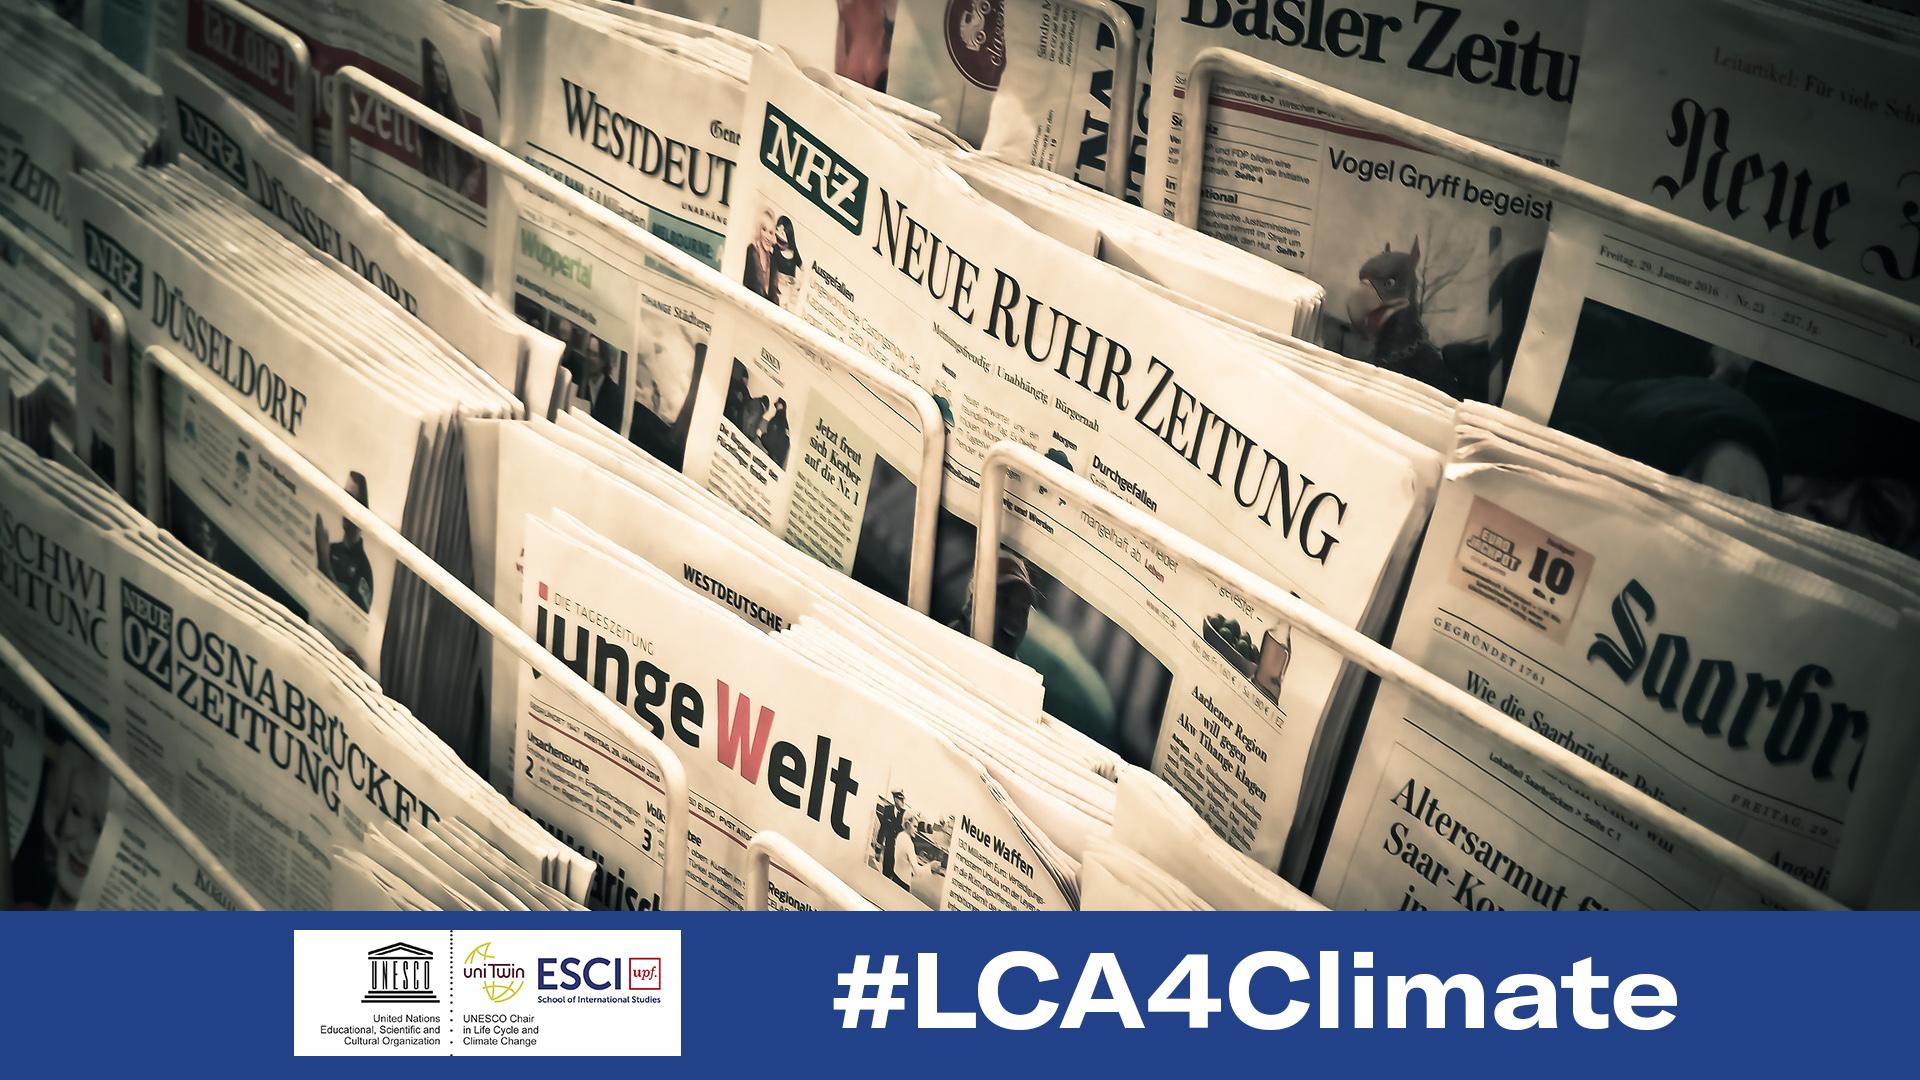 LCA4Climate líder d'opinió